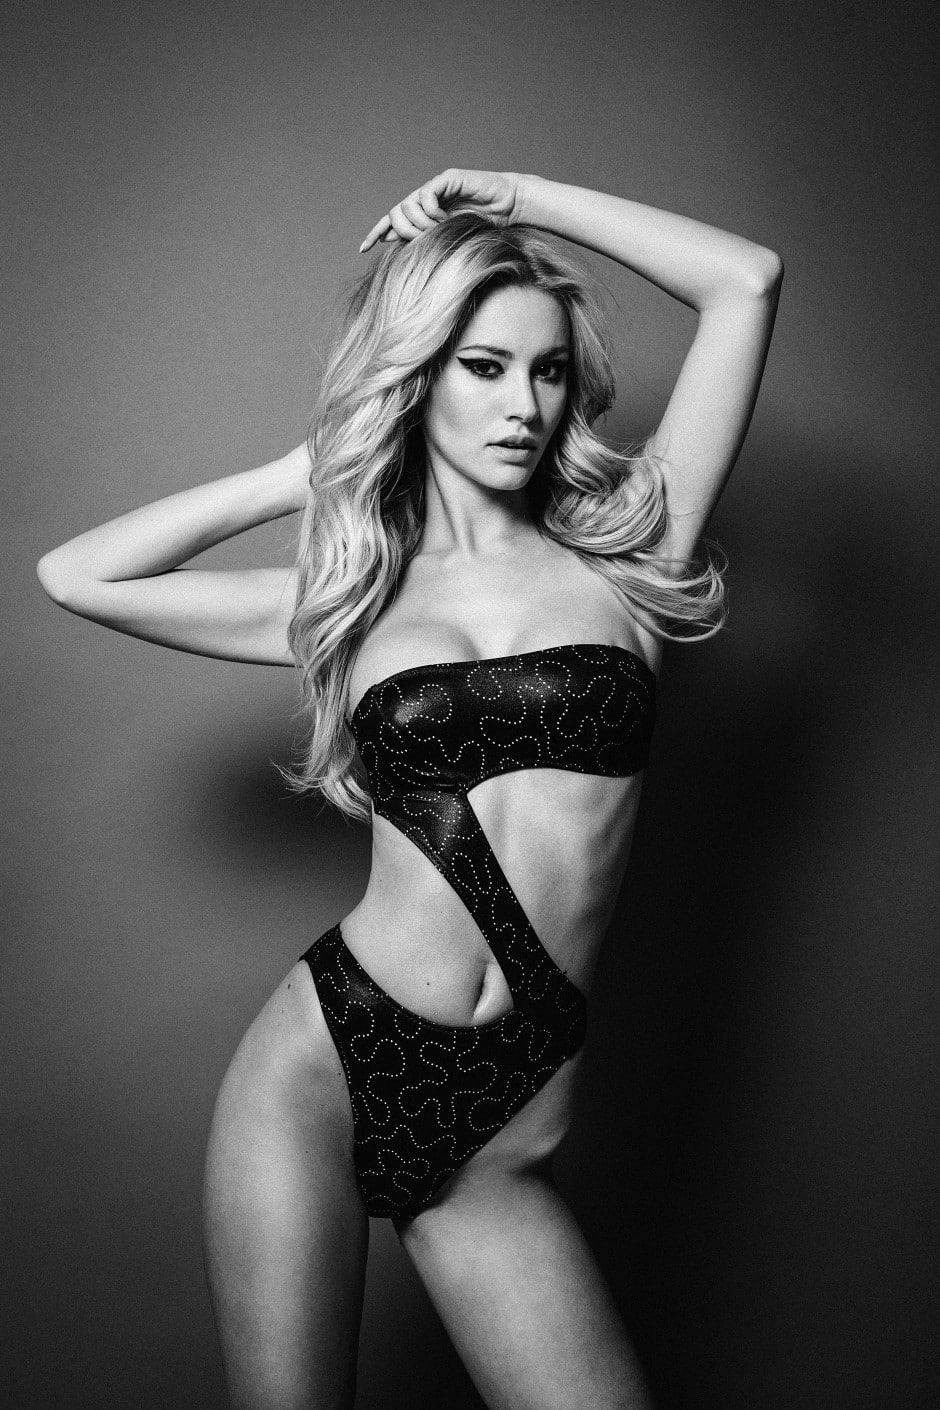 Full video karen mcdougal sex tape nude donald trump ex leaked,Lizzie Kelly pics XXX picture Lucia loi sexy 60 photos,Tilda Swinton Orlando